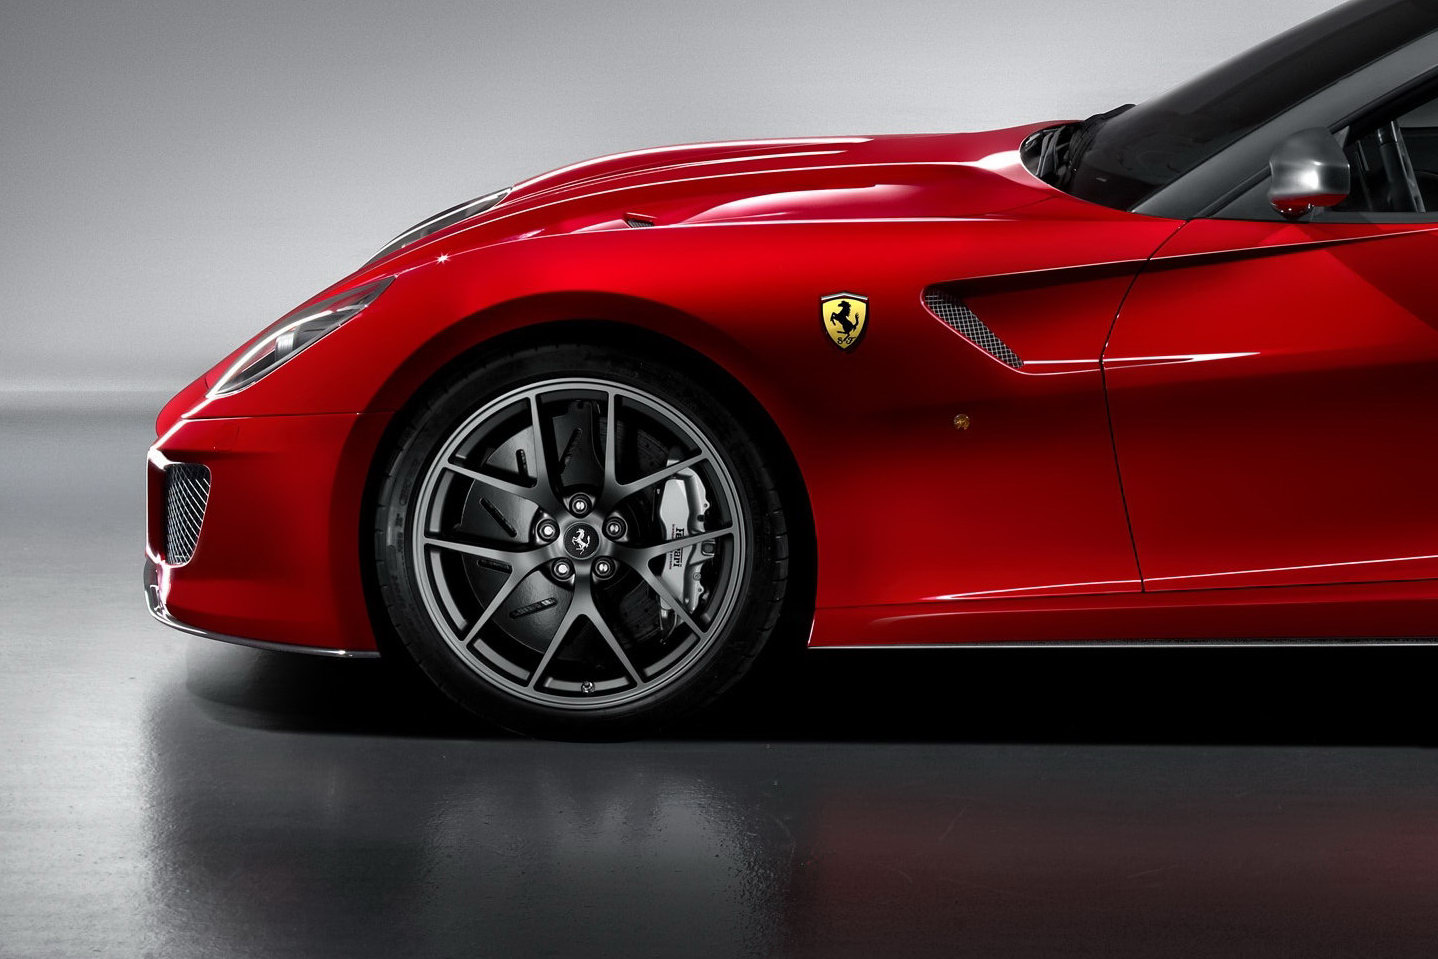 Ferrari 599 related imagesstart 50 weili automotive network new ferrari 599 gto maranellos fastest ever road going model vanachro Image collections